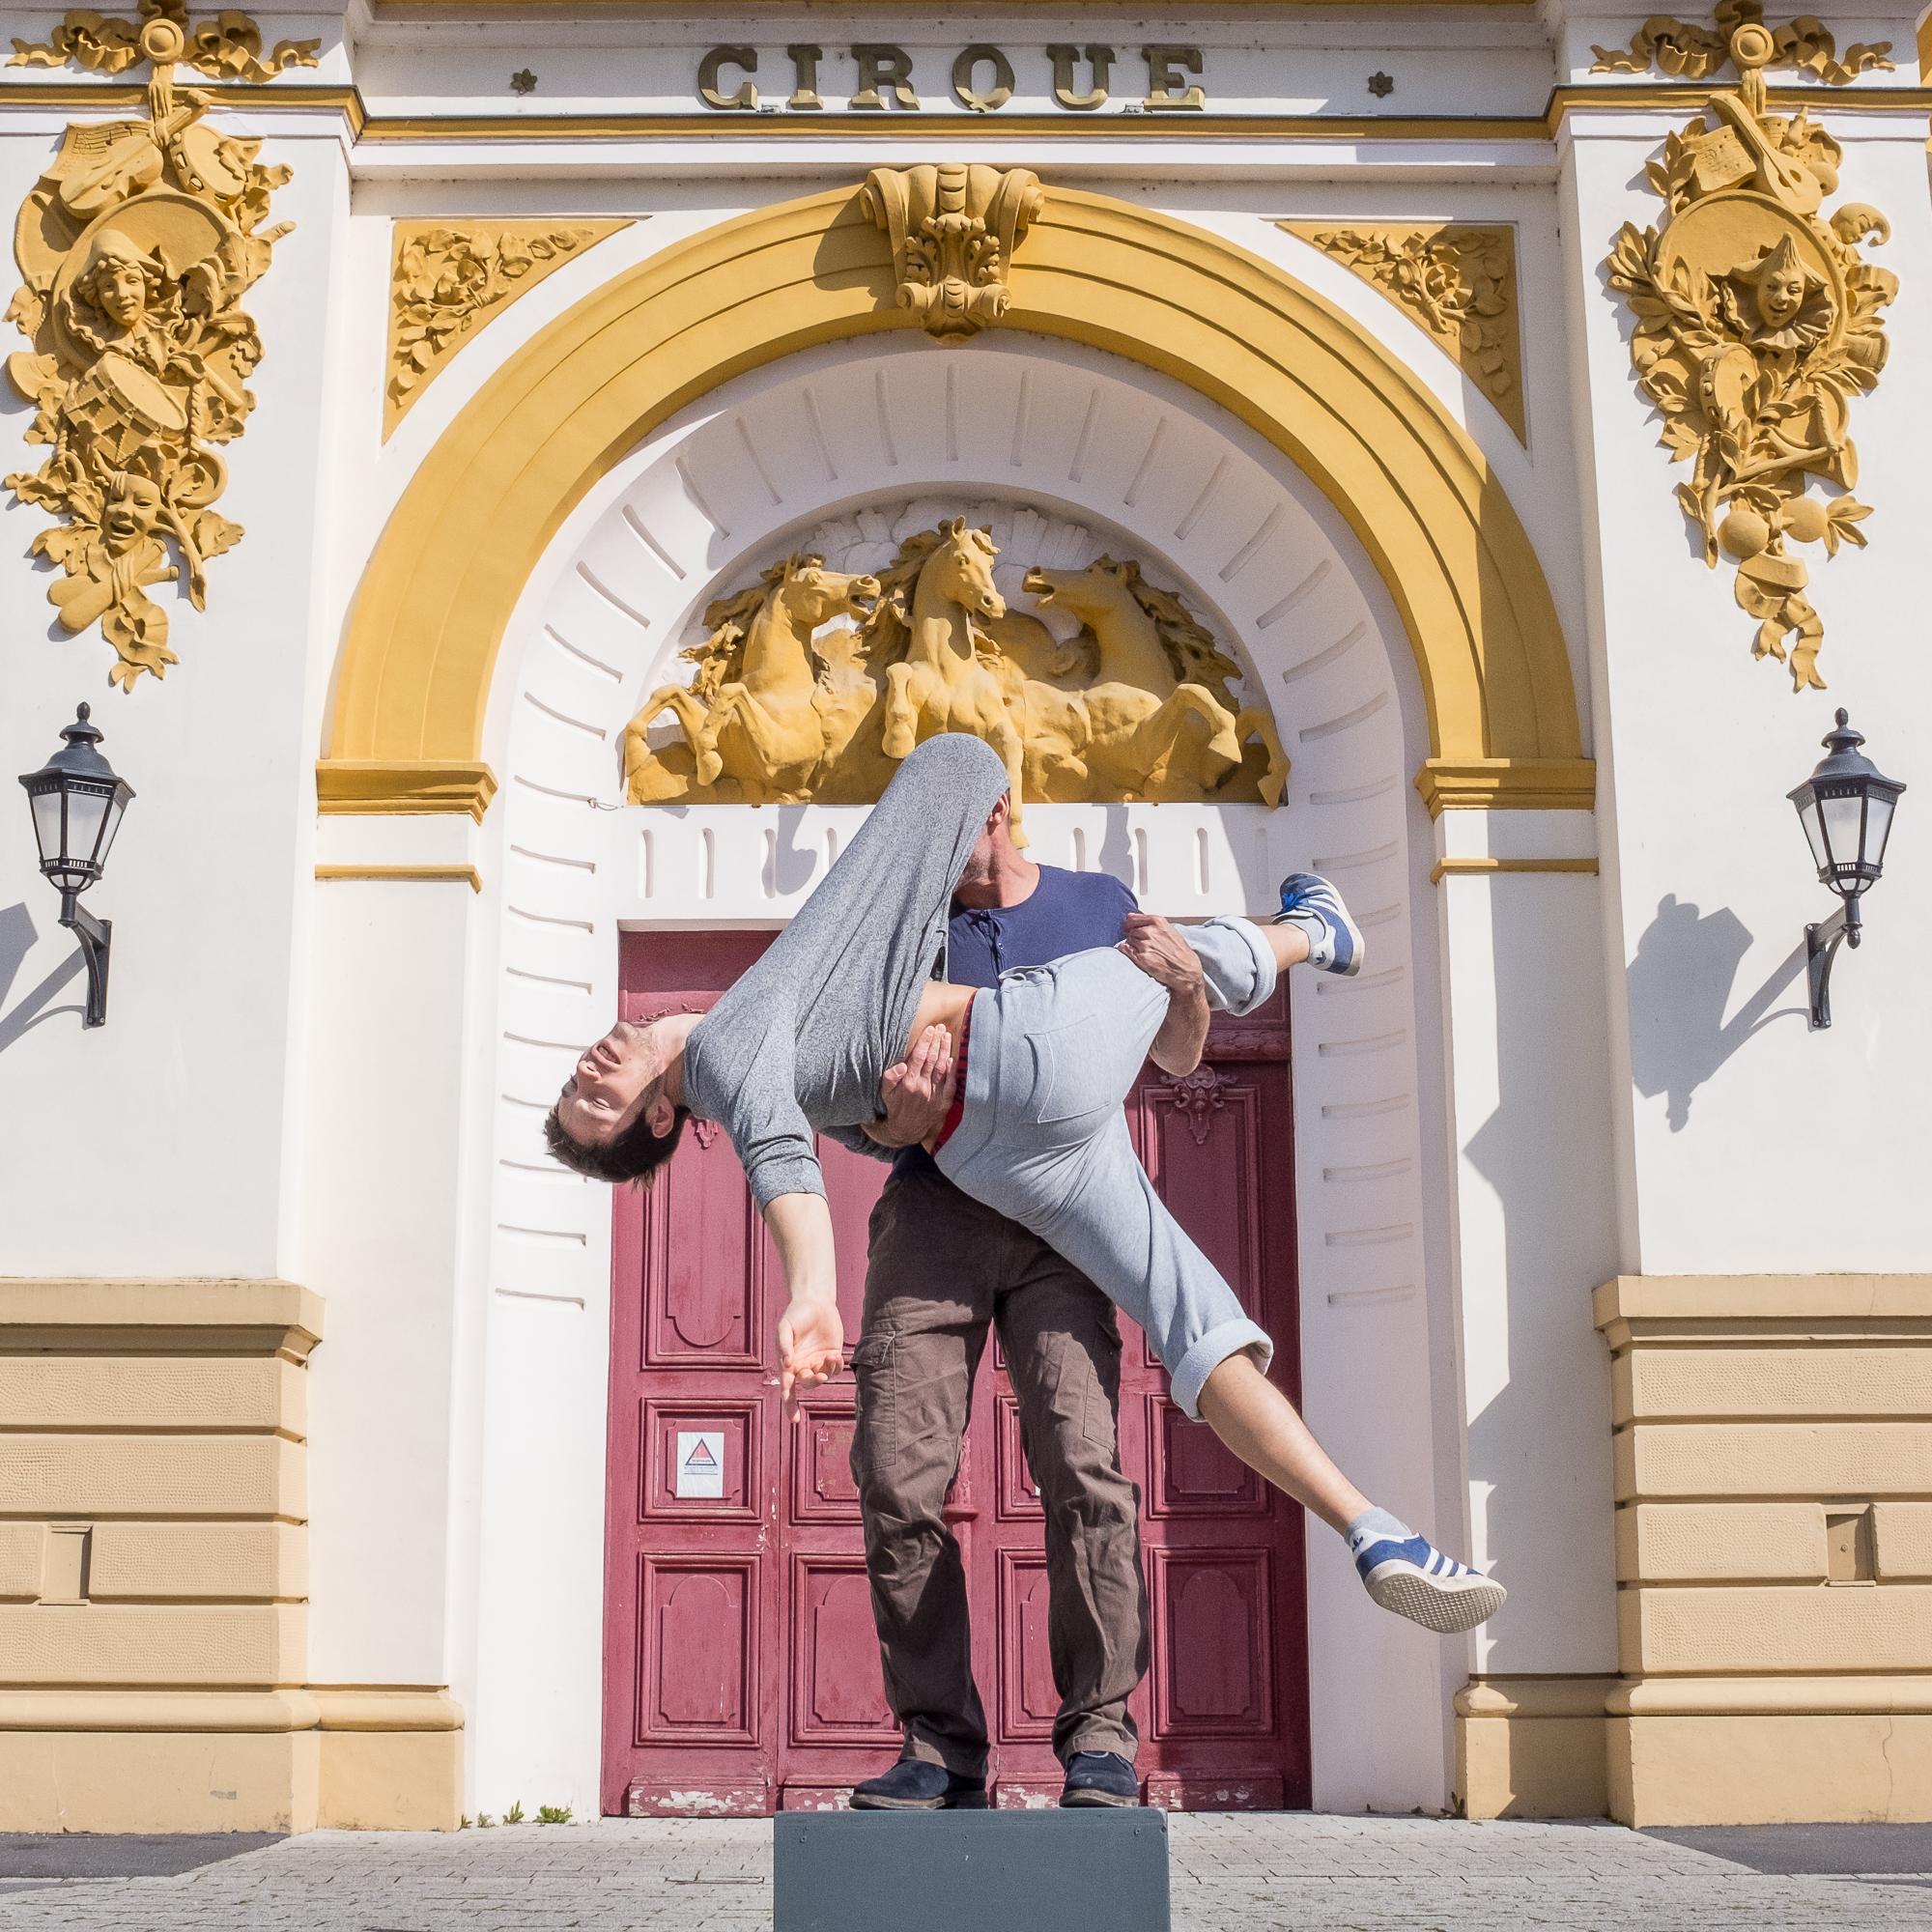 Cirque - Davide